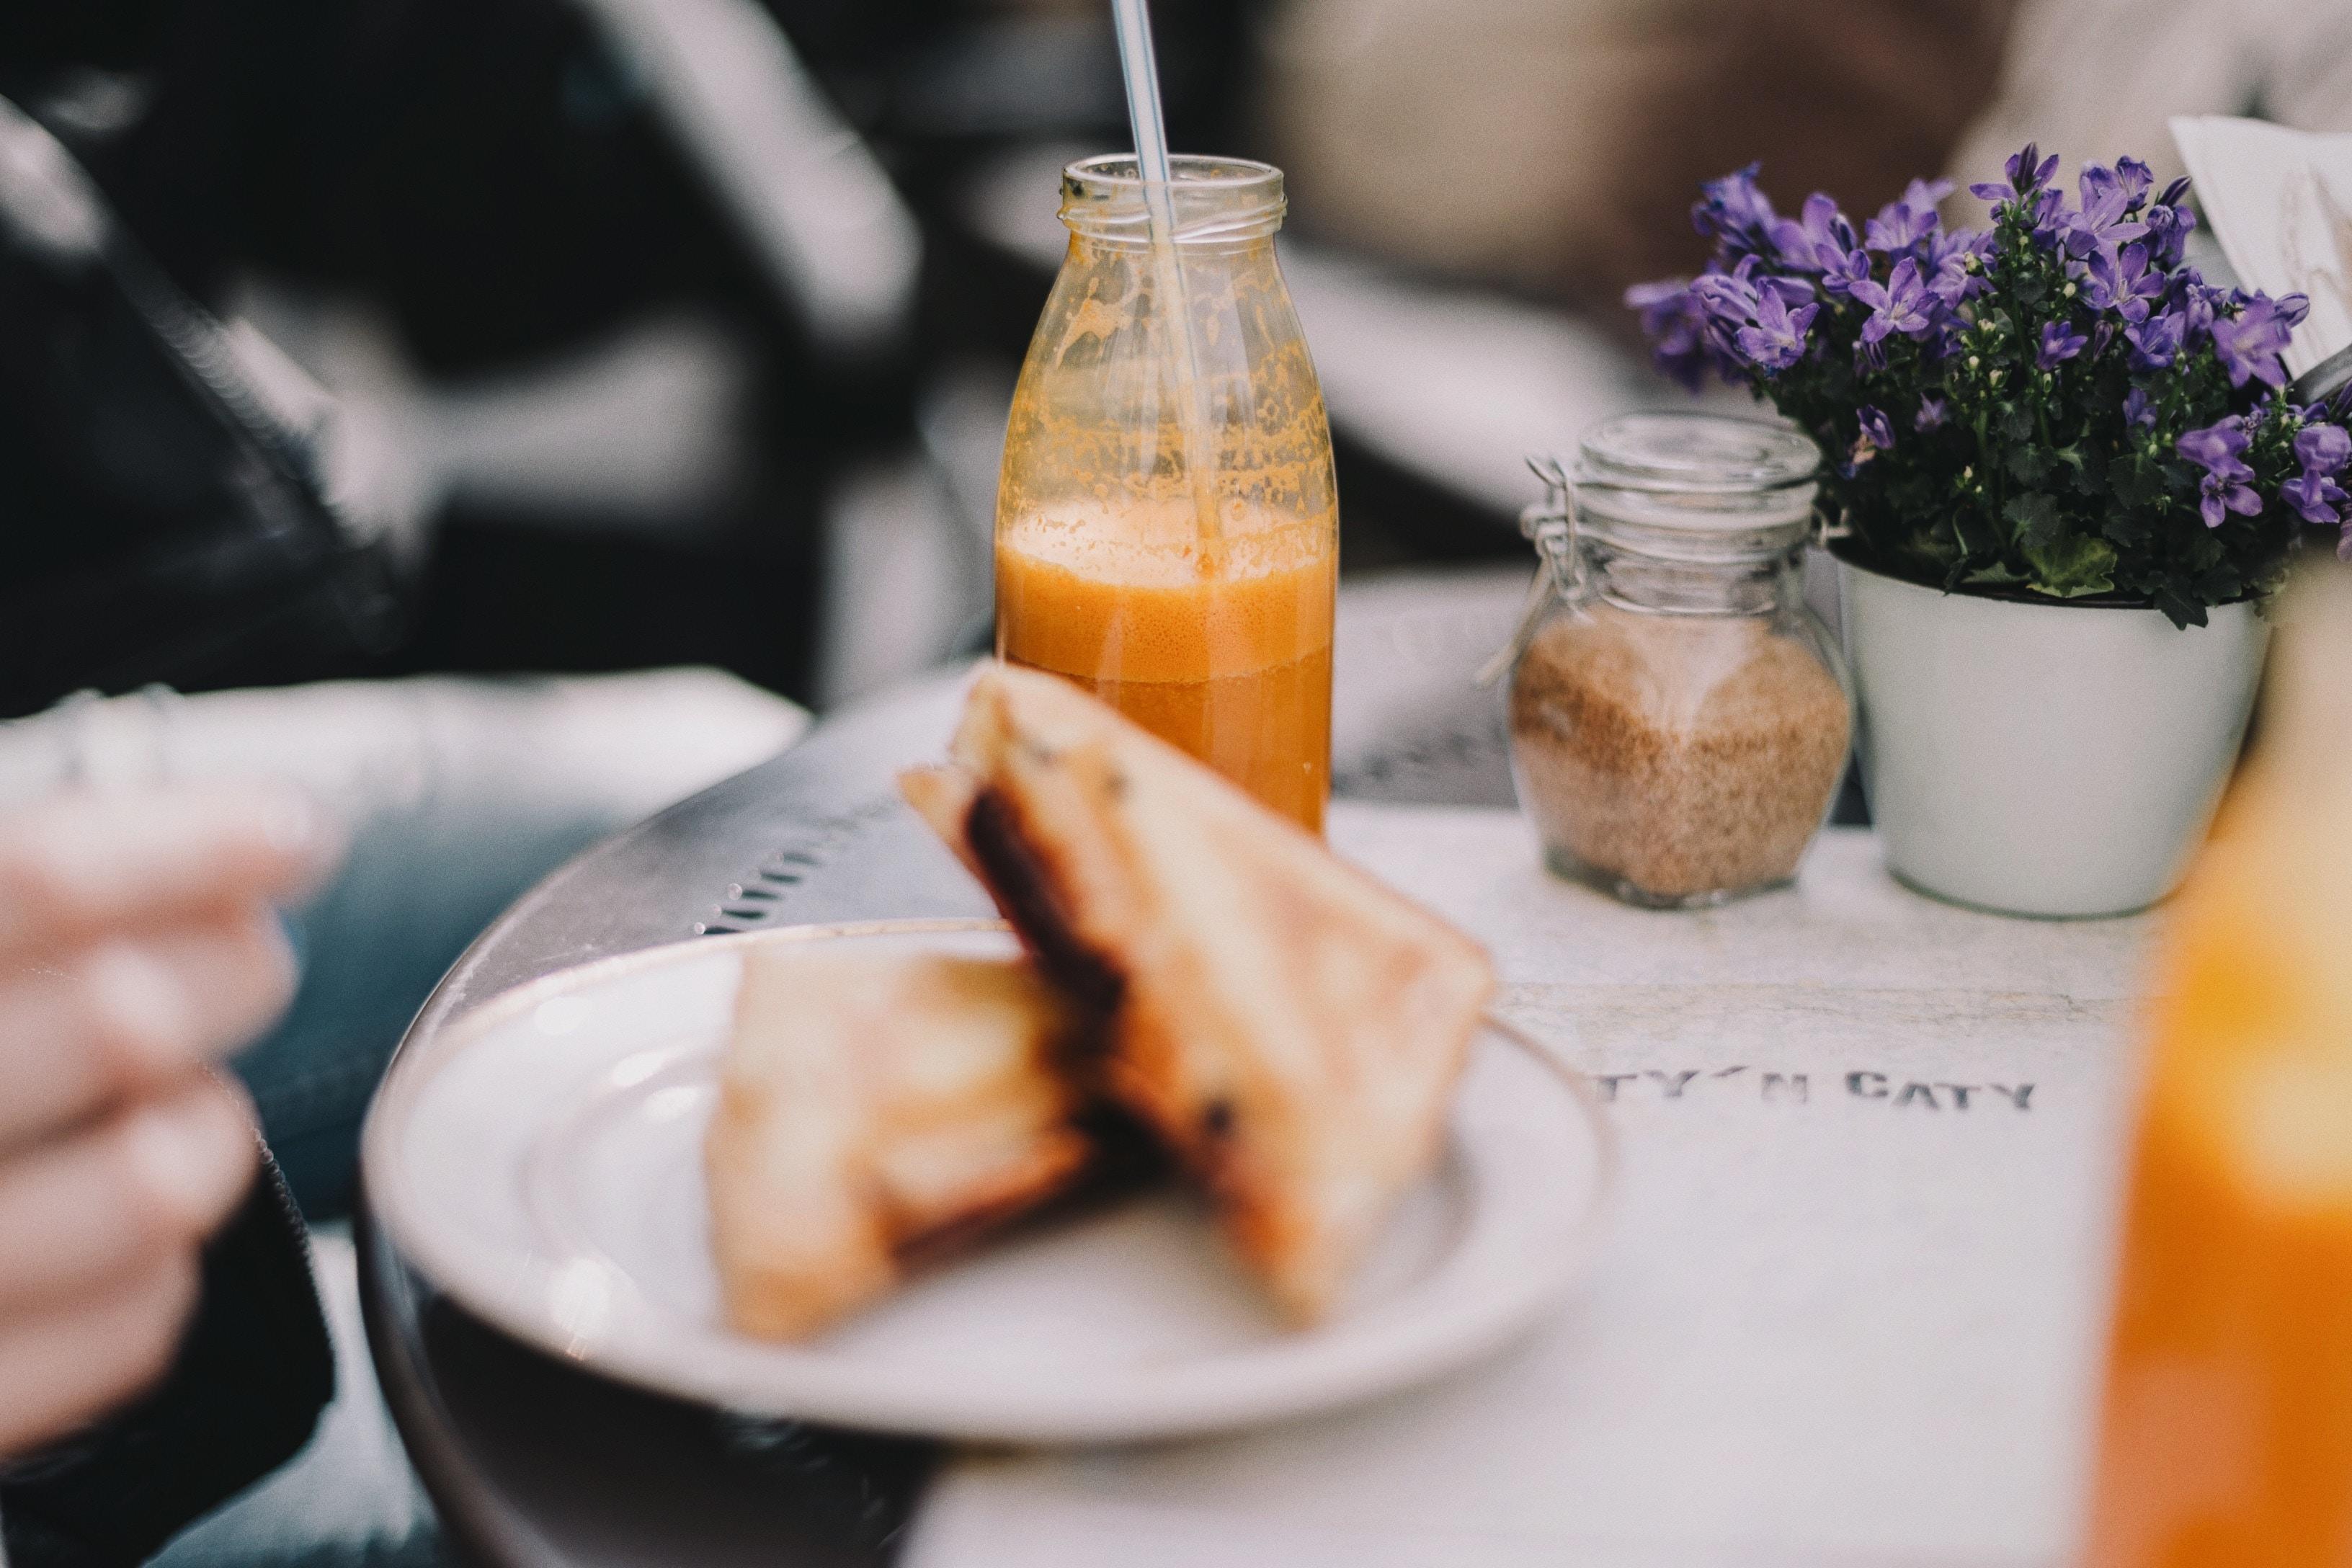 toasted bread on plate near bottle